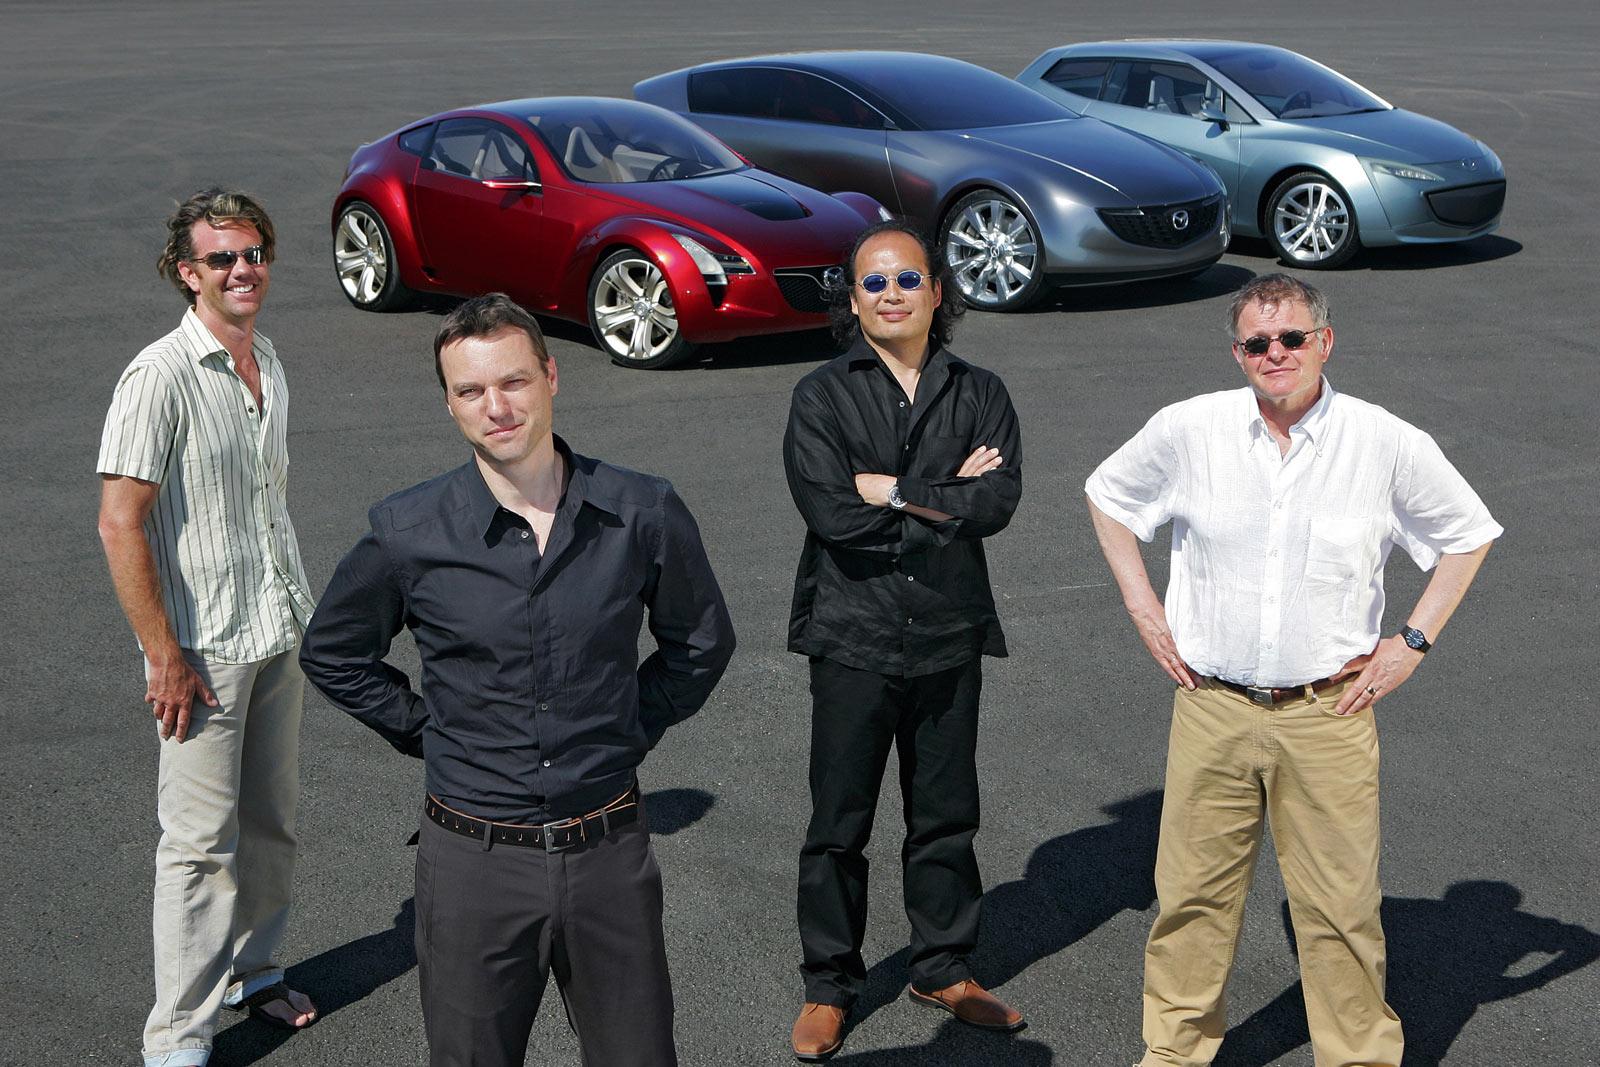 Mazda-Nagare-designers-lg.jpg